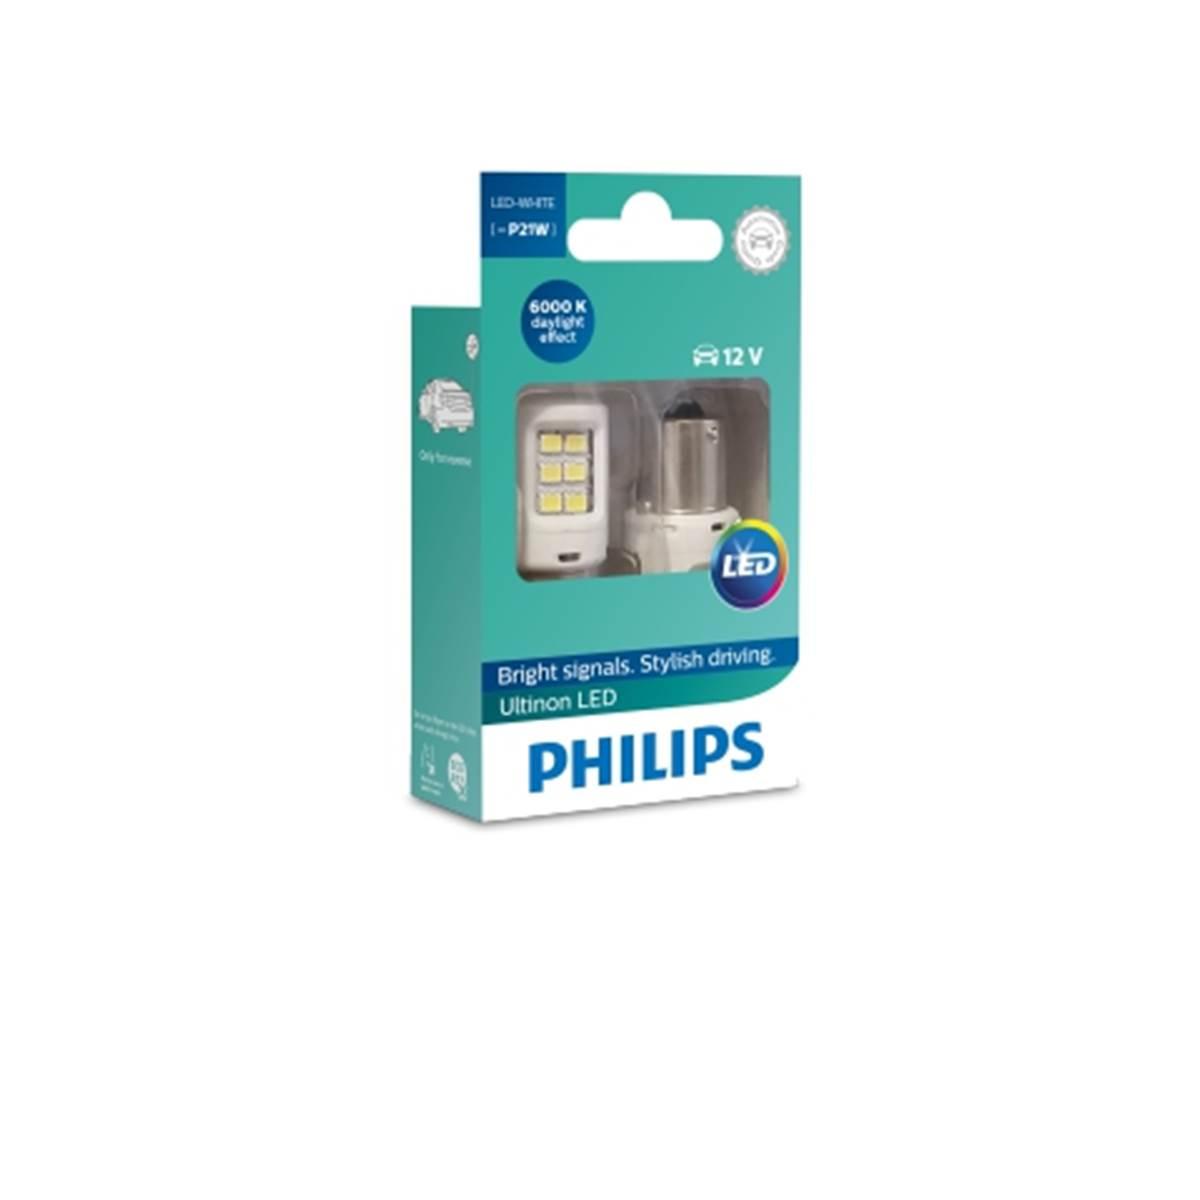 2 ampoules Philips premium LED P21W blanc